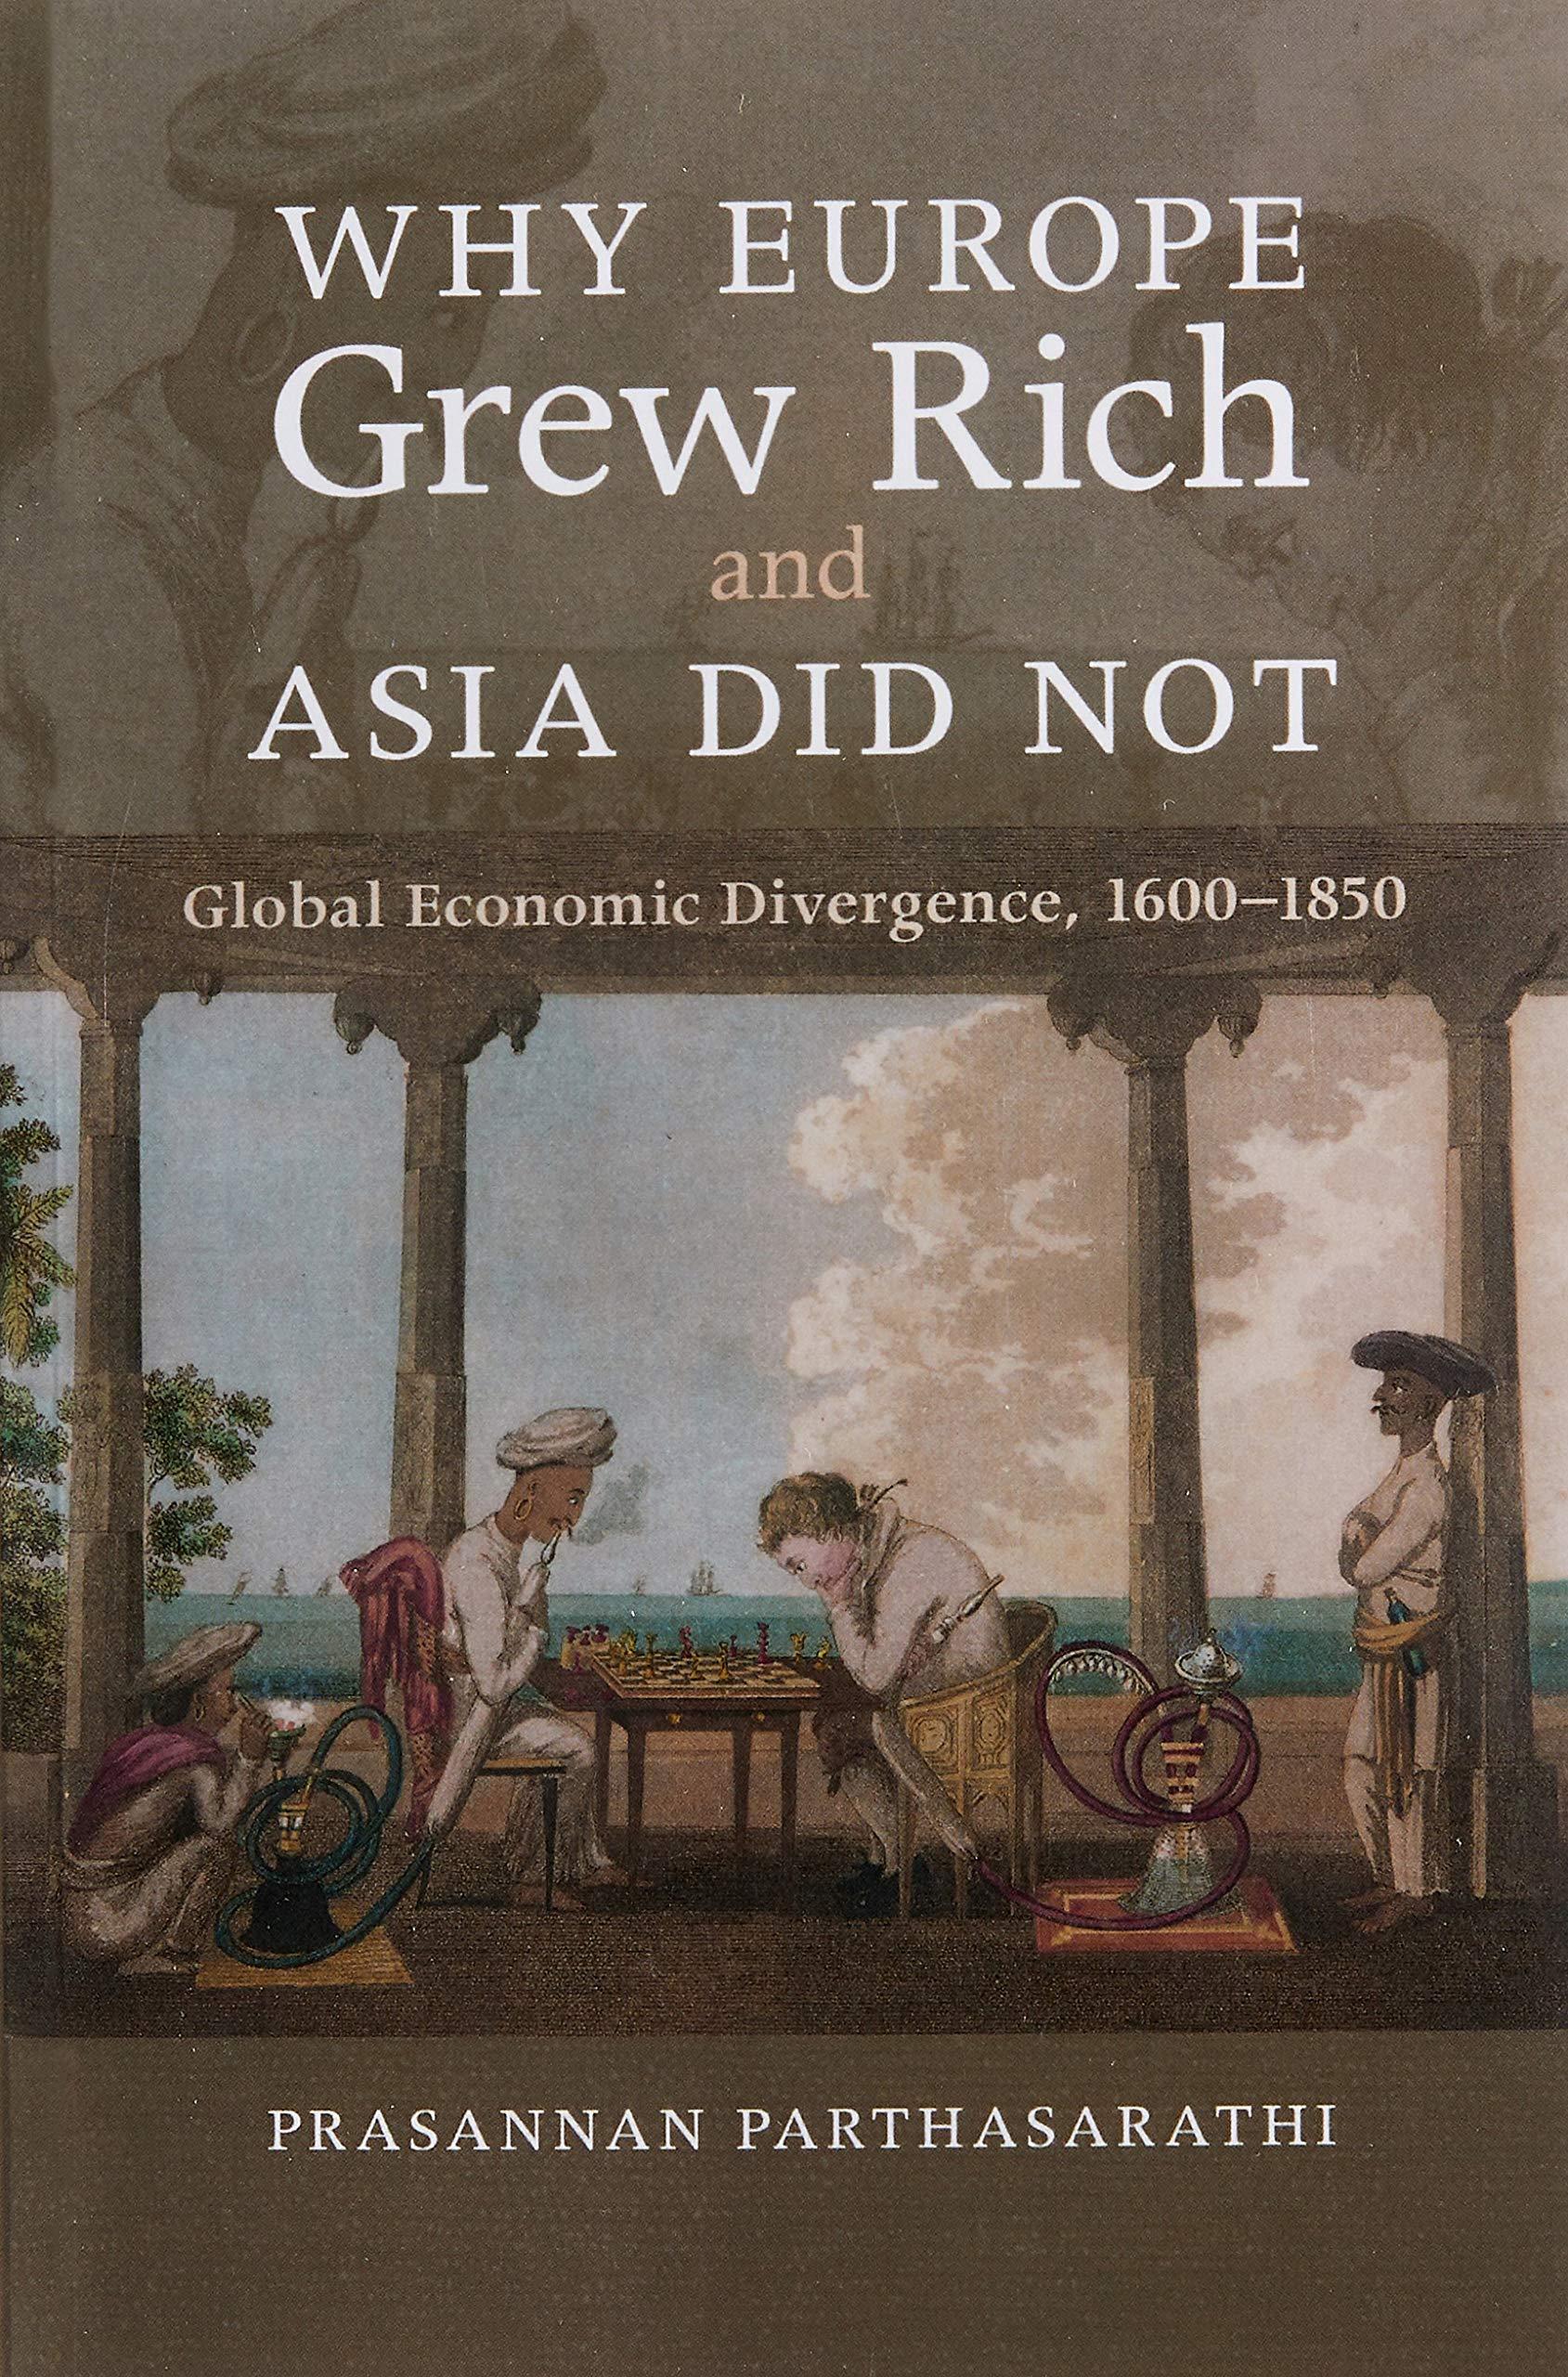 Why Europe Grew Rich and Asia Did Not: Global Economic Divergence, 1600-1850:  Amazon.co.uk: Prasannan Parthasarathi: 9780521168243: Books